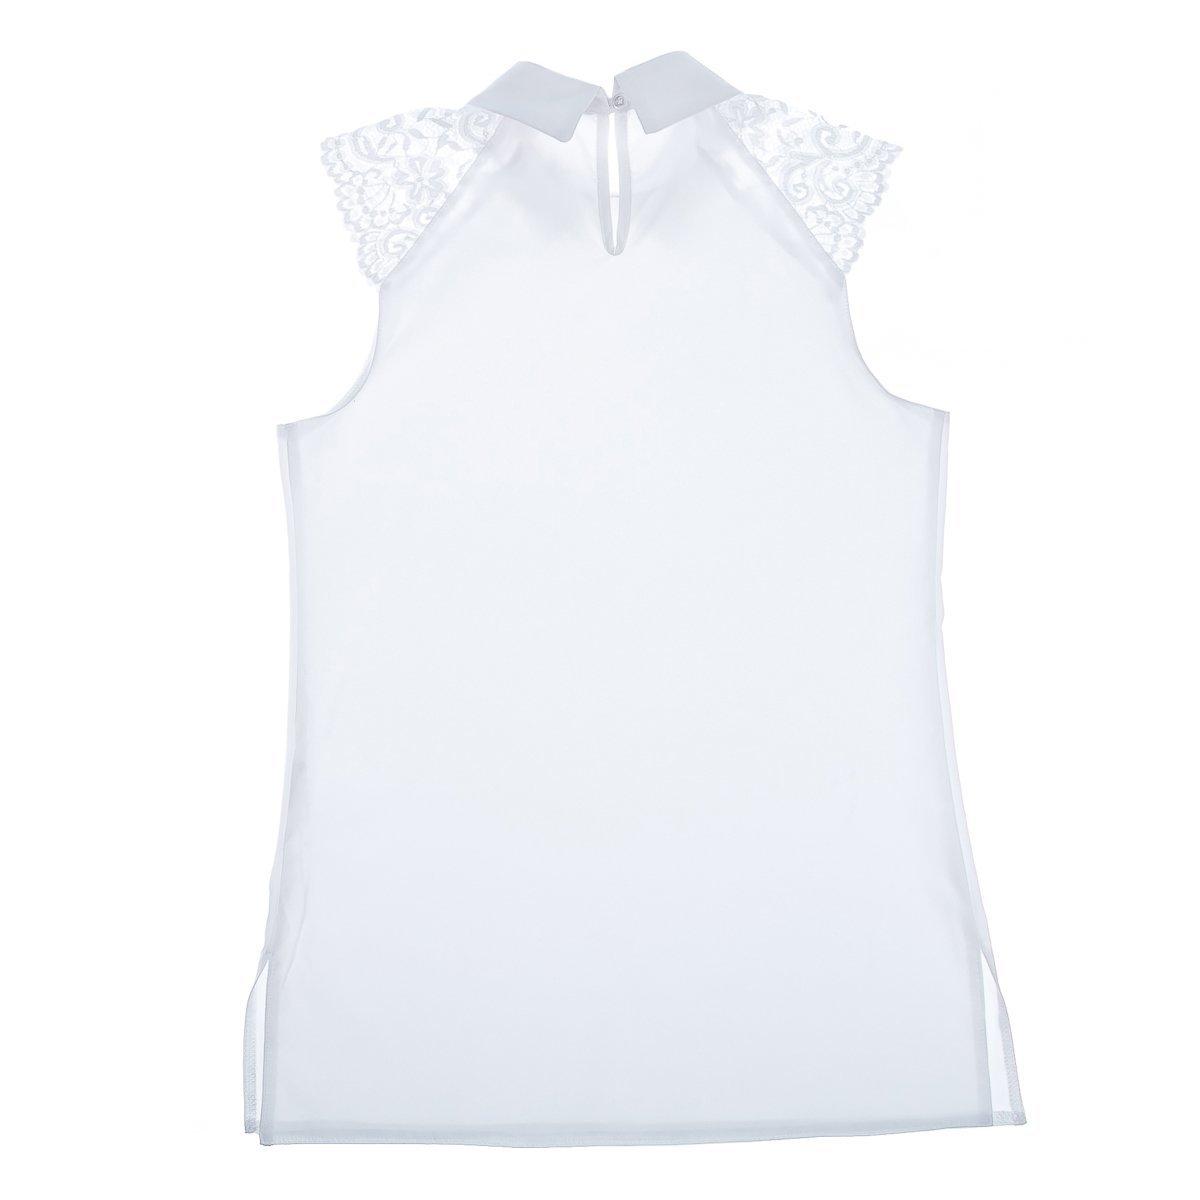 Купить Блузки, рубашки, болеро, Блуза Mevis Morning Dew, р. 164 2711 ТМ: Mevis, белый